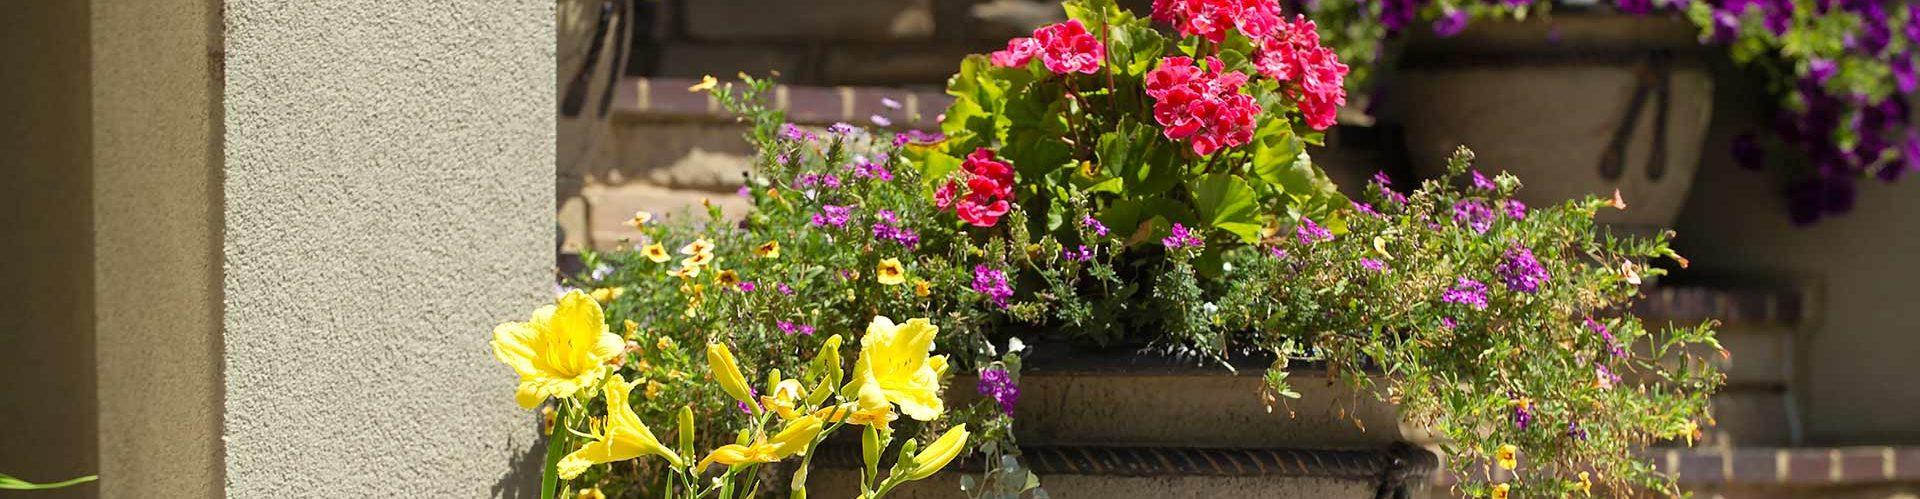 Flowers-Designs-Fargo-ND-NEL-e1491318011950-1